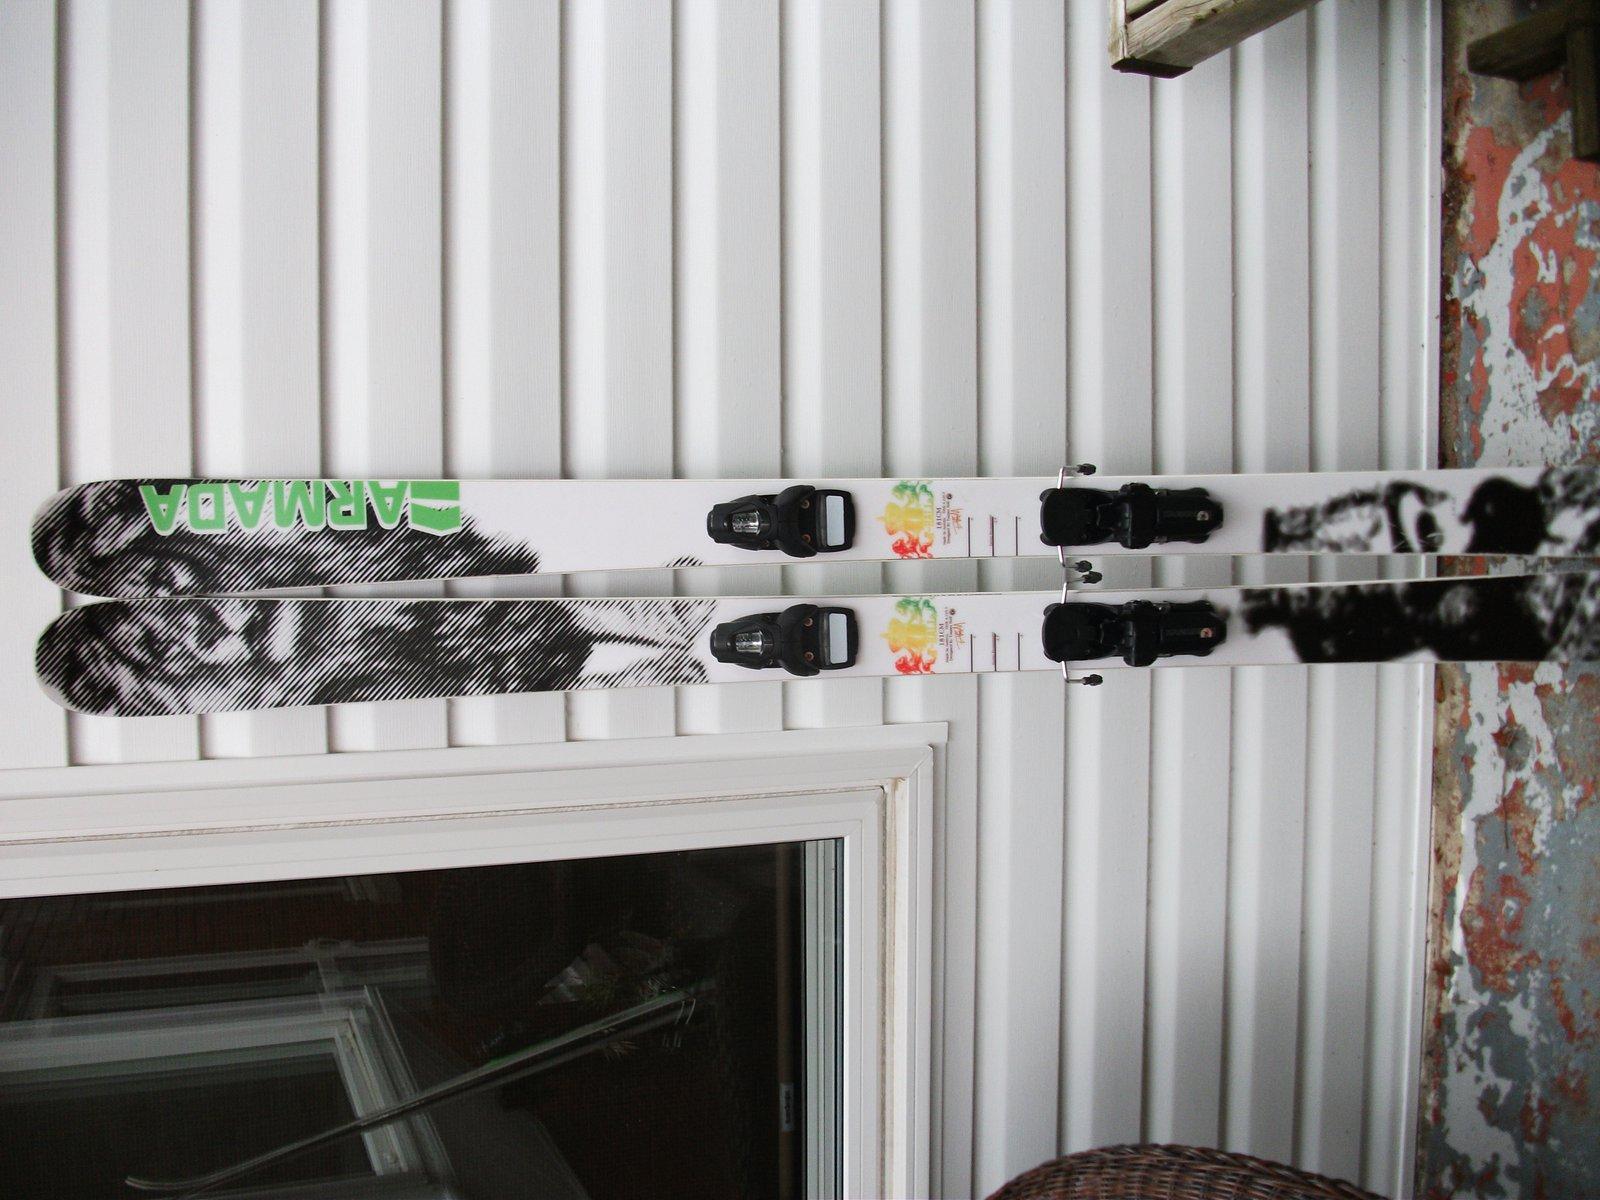 Armada t-halls 181cm